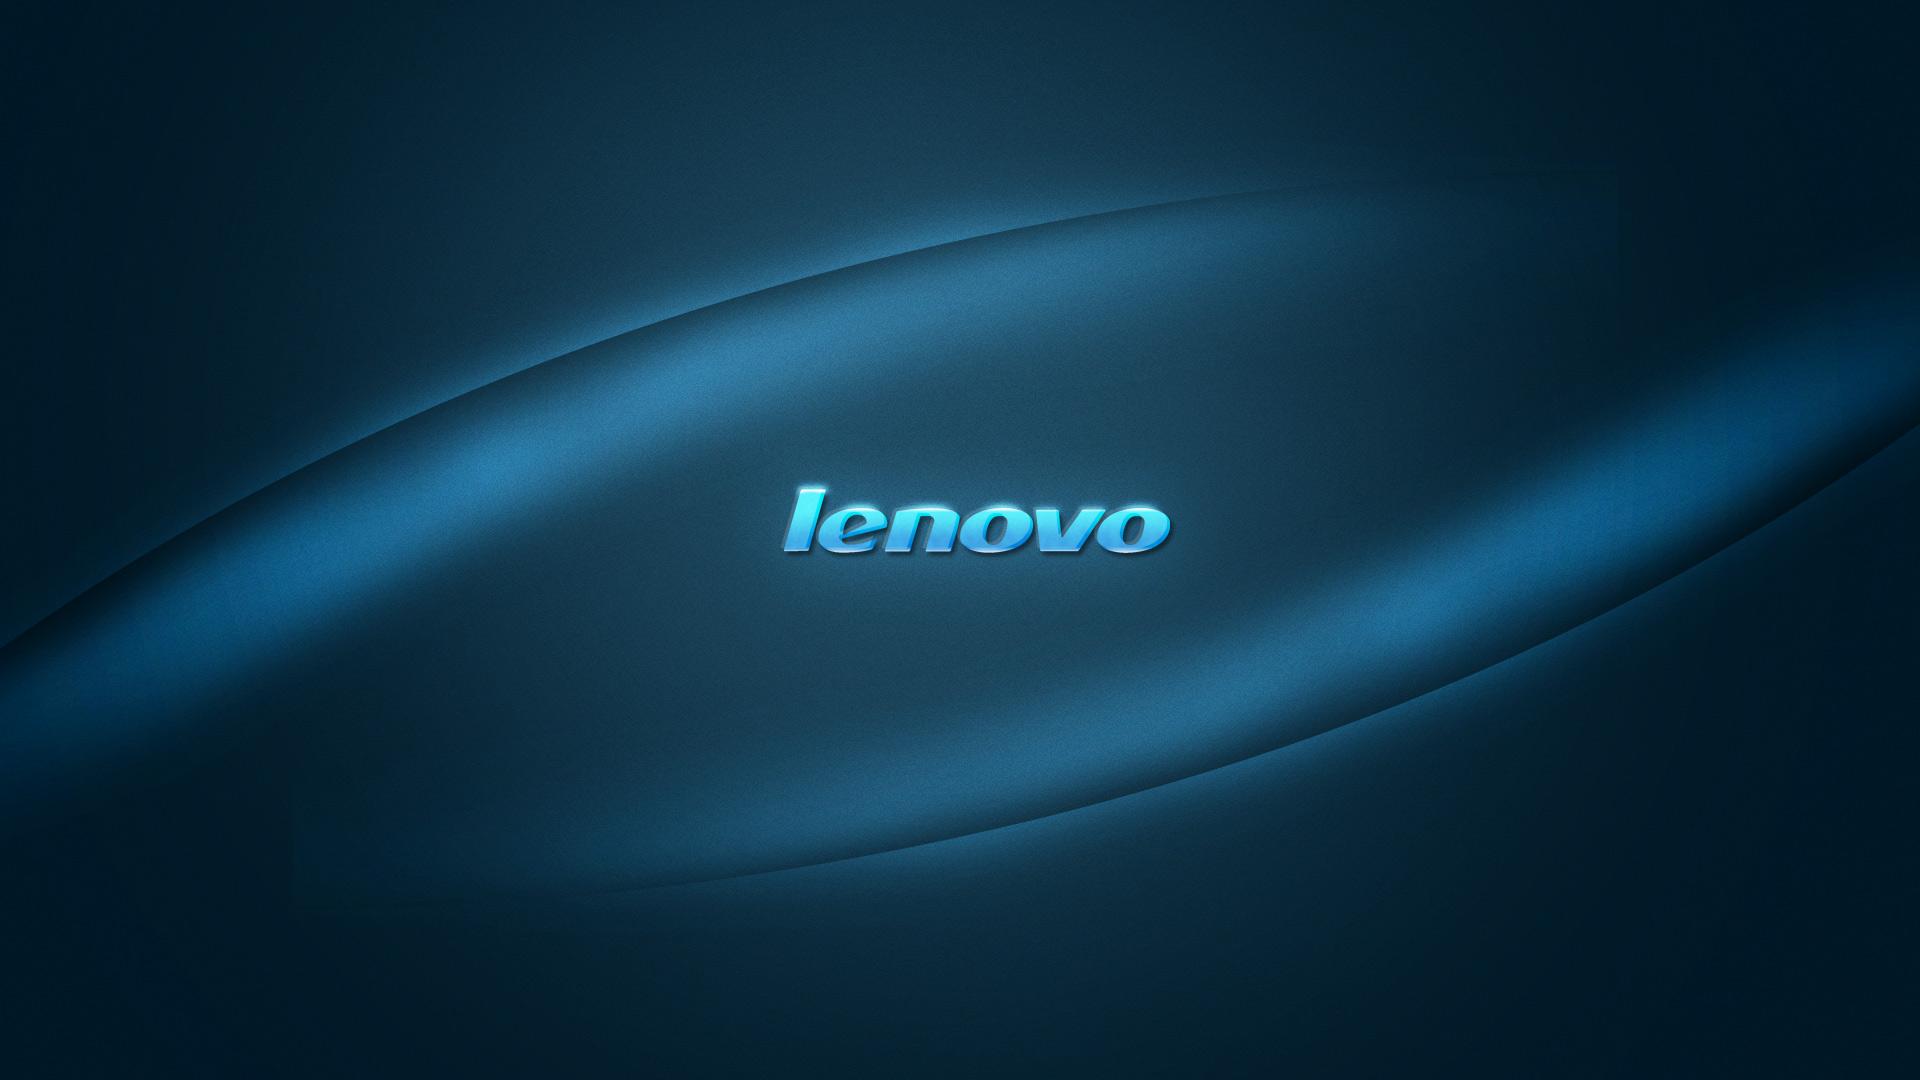 Lenovo windows 10 wallpaper wallpapersafari lenovo wallpapers lenovo lenovo wallpaper windows 8 voltagebd Image collections